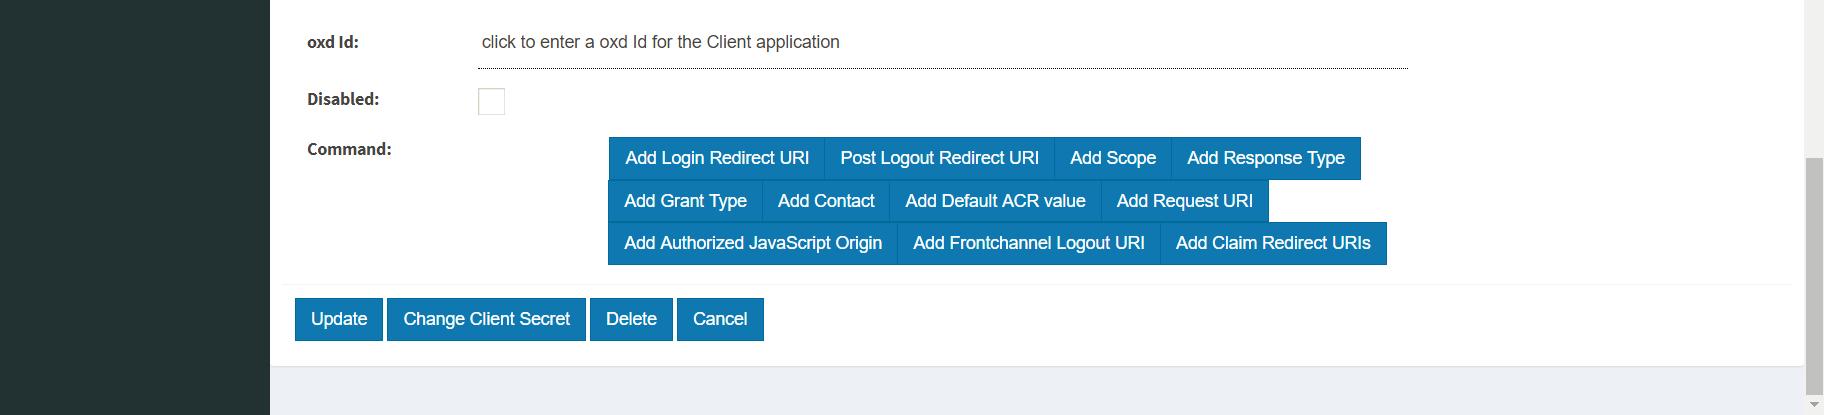 gluu_openidc_client_buttons